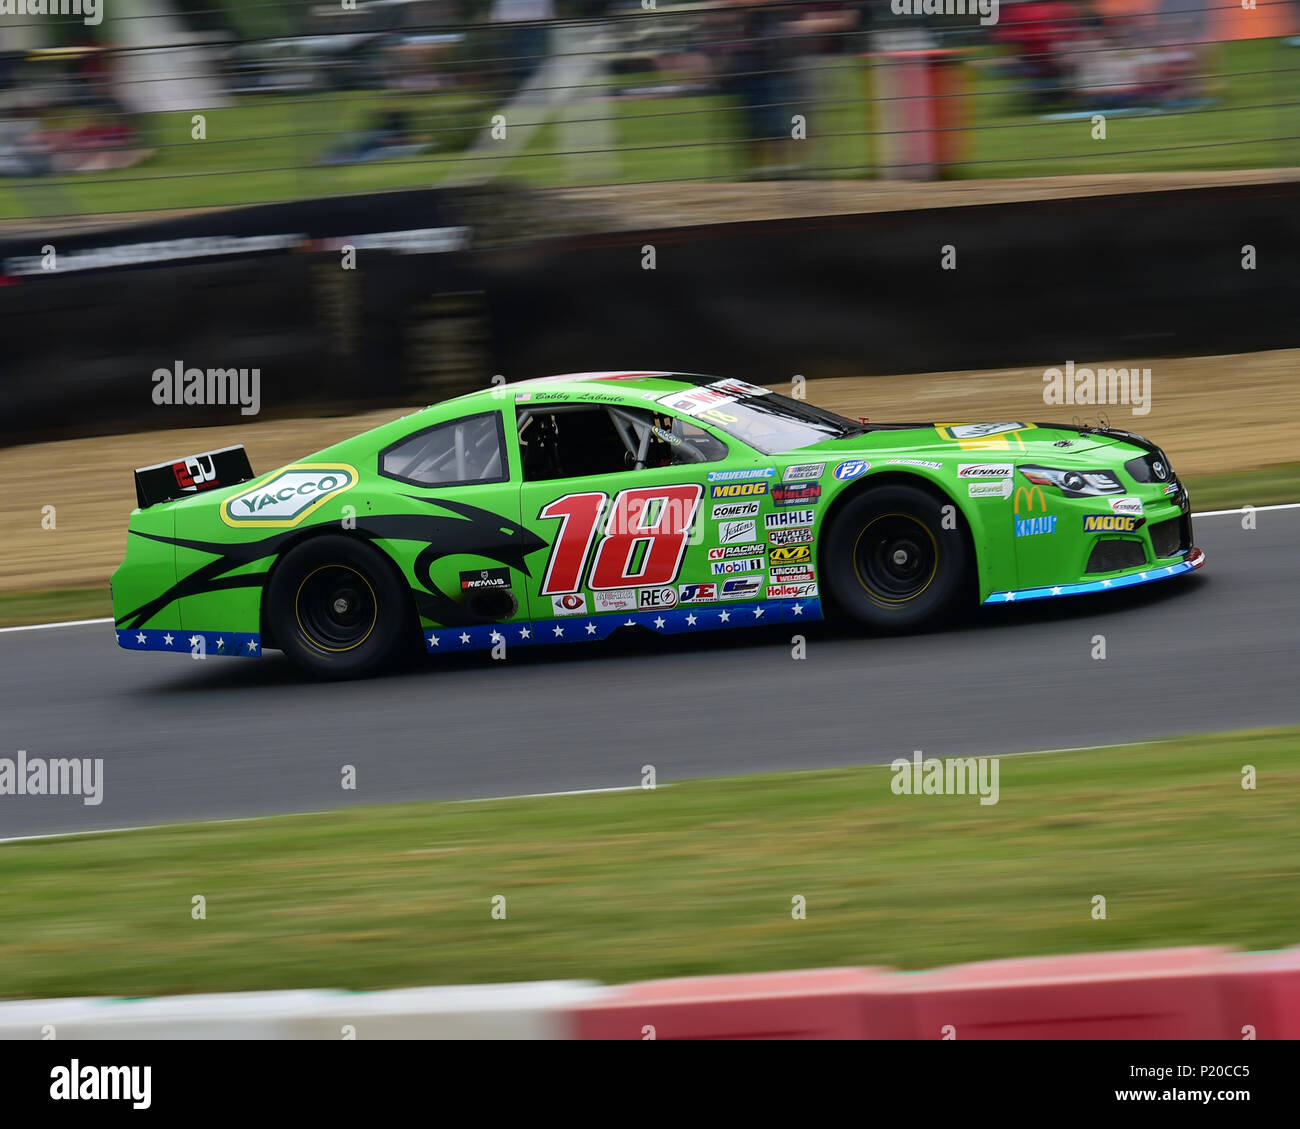 Bobby Labonte Toyota Camry Nascar Whelen Euro Series Elite 2